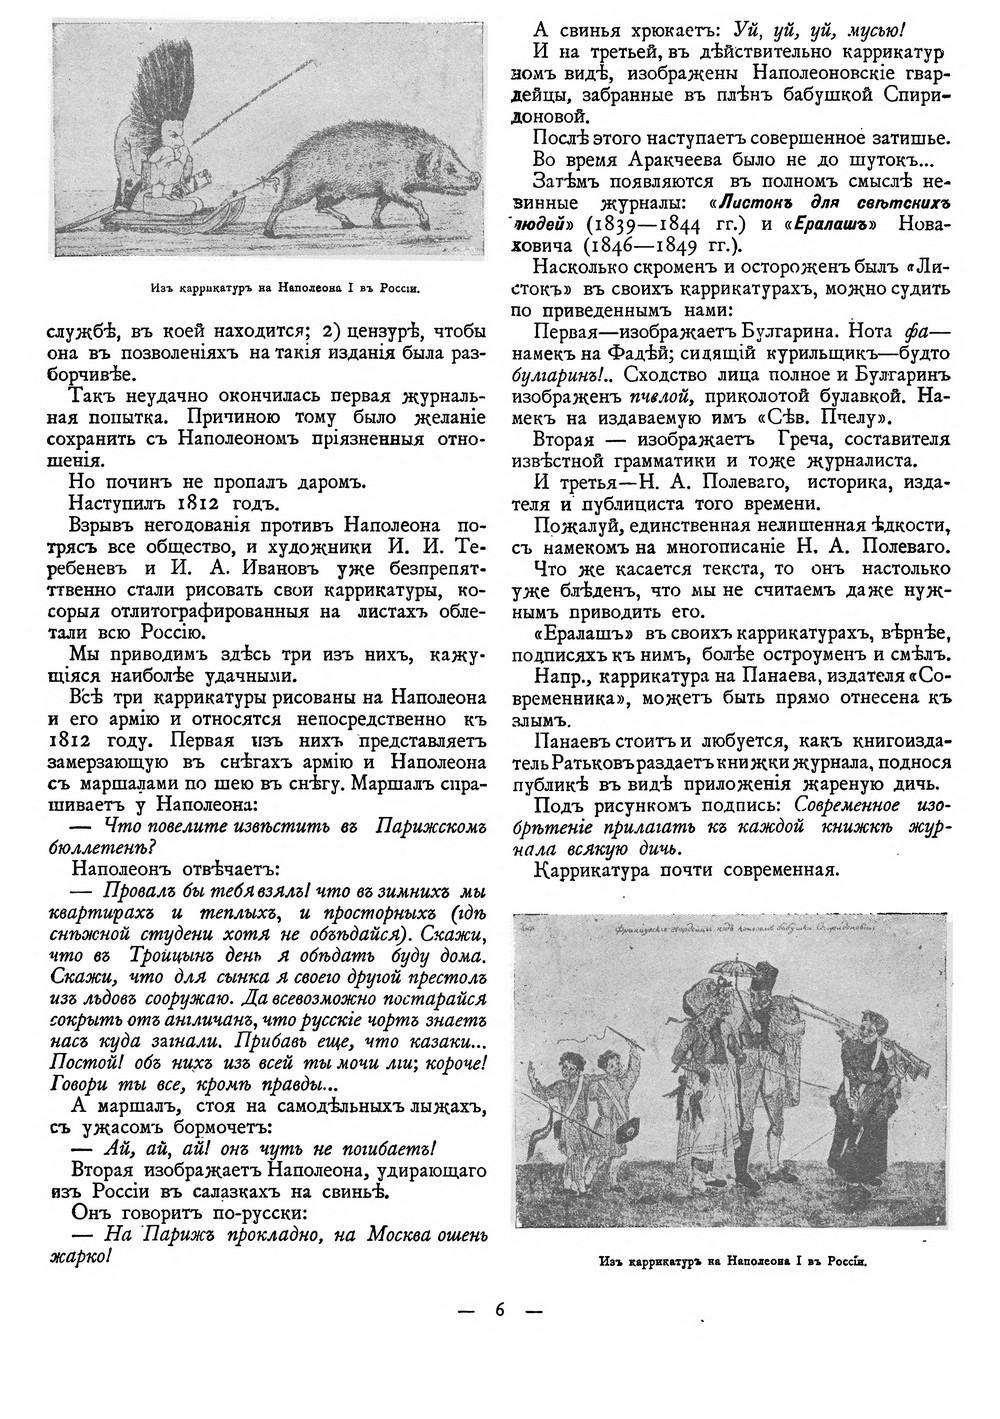 http://i2.imageban.ru/out/2014/01/06/61169626d69c8b1a328cb14422d59389.jpg